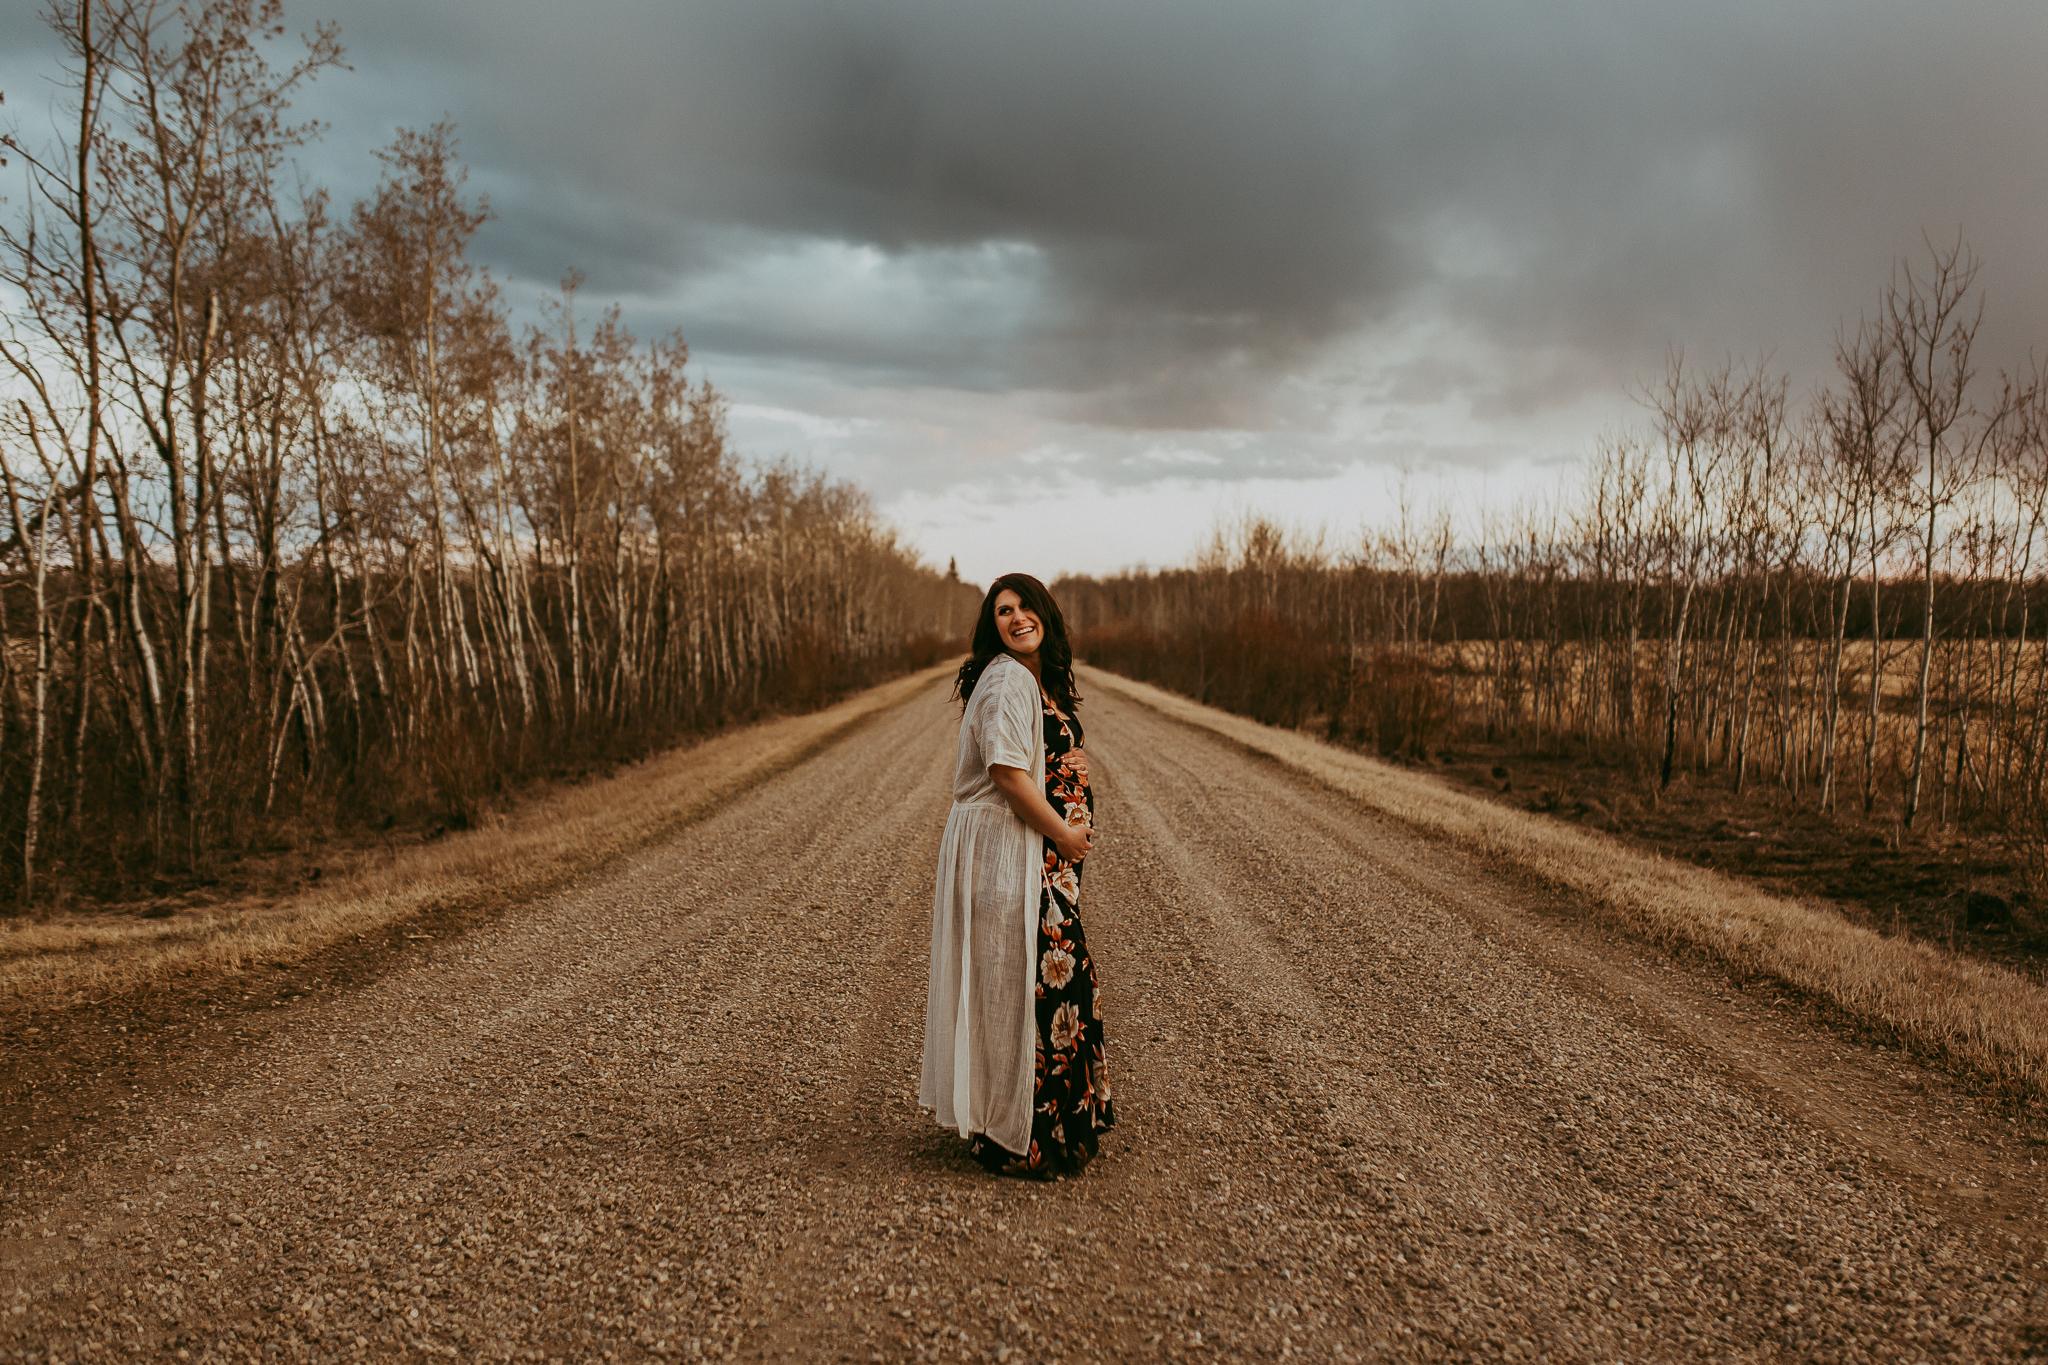 Alina-Joy-Photography-Cold-Lake-Maternity-Photographer-Josee-92.jpg